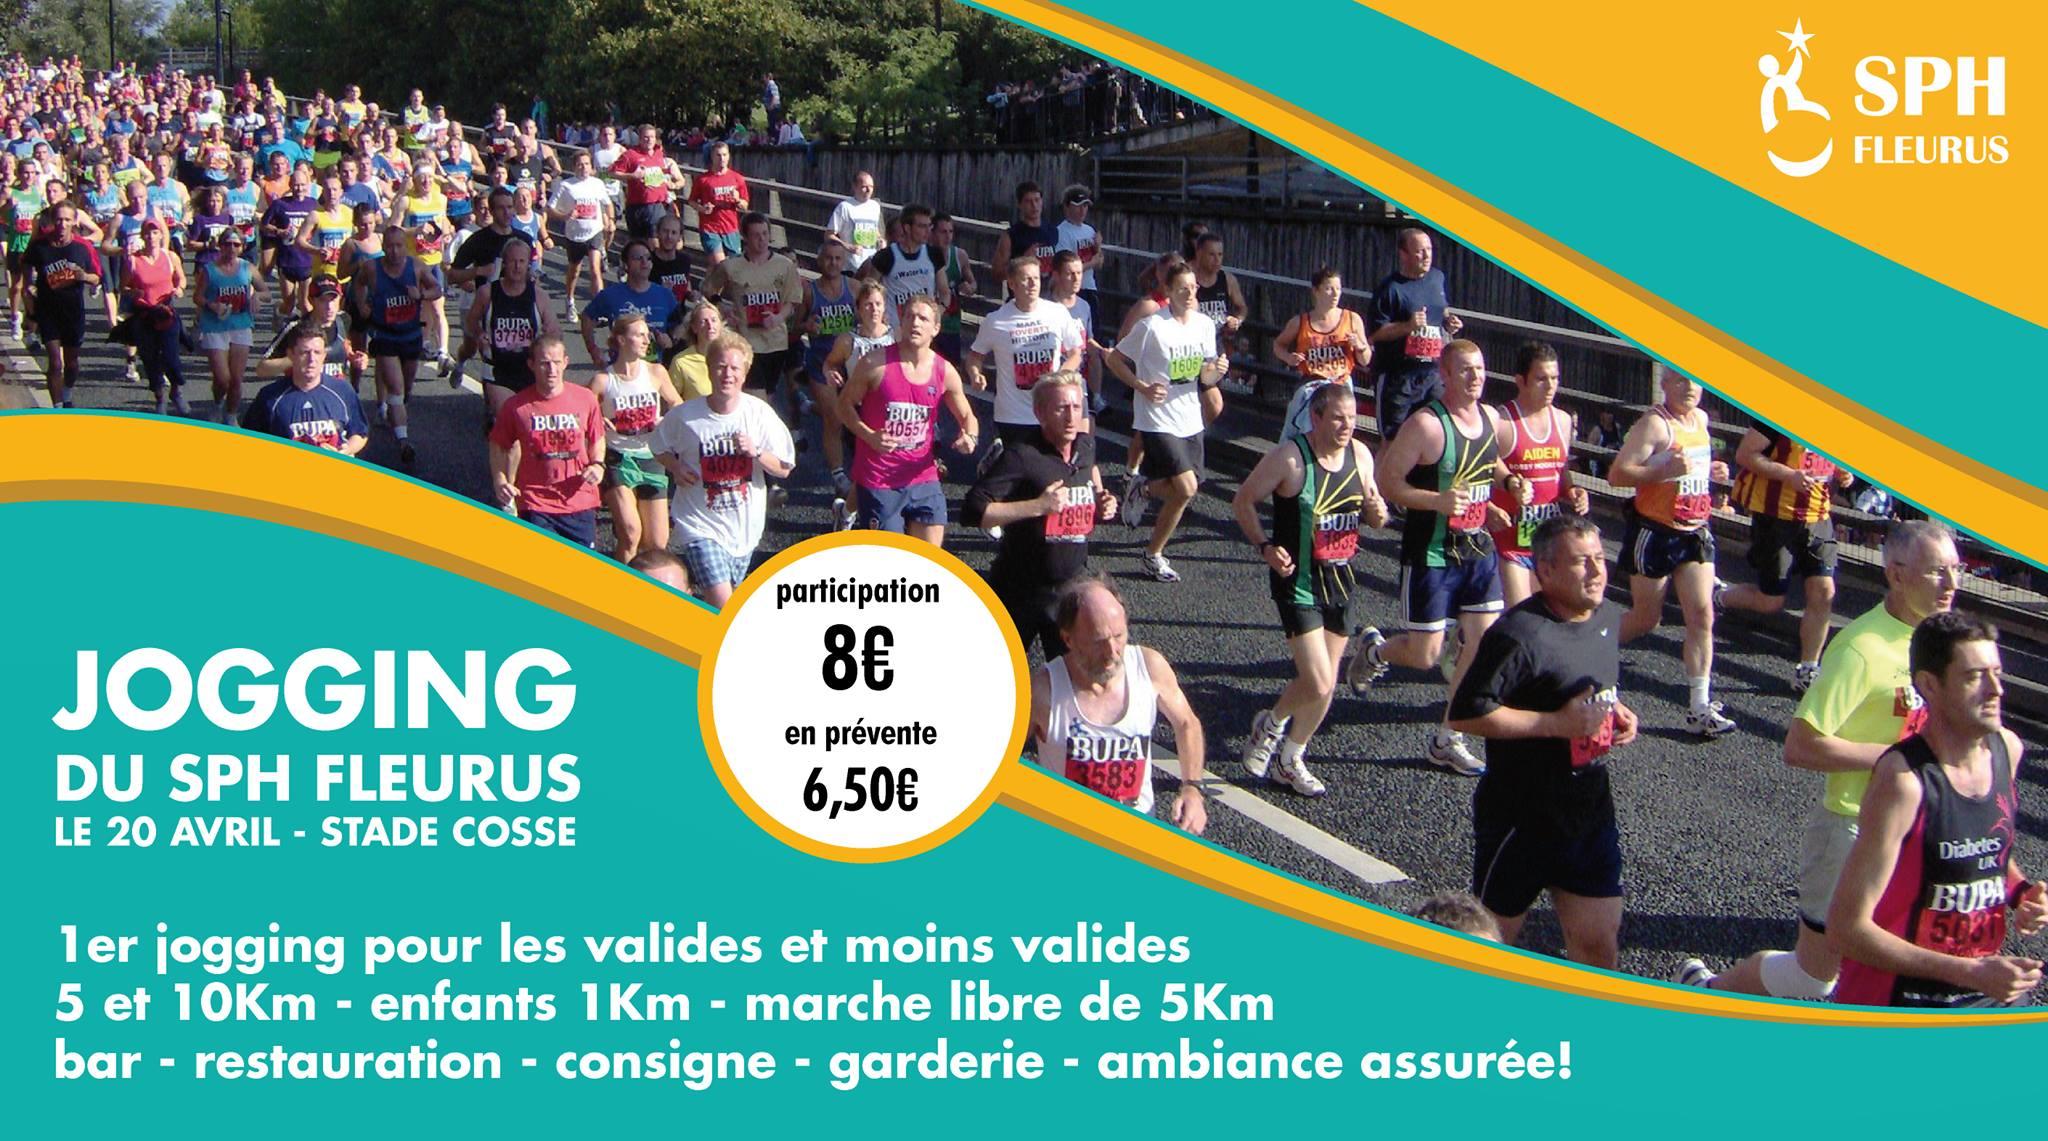 SPH-Fleurus-Jogging-Orthopedie-Toussaint